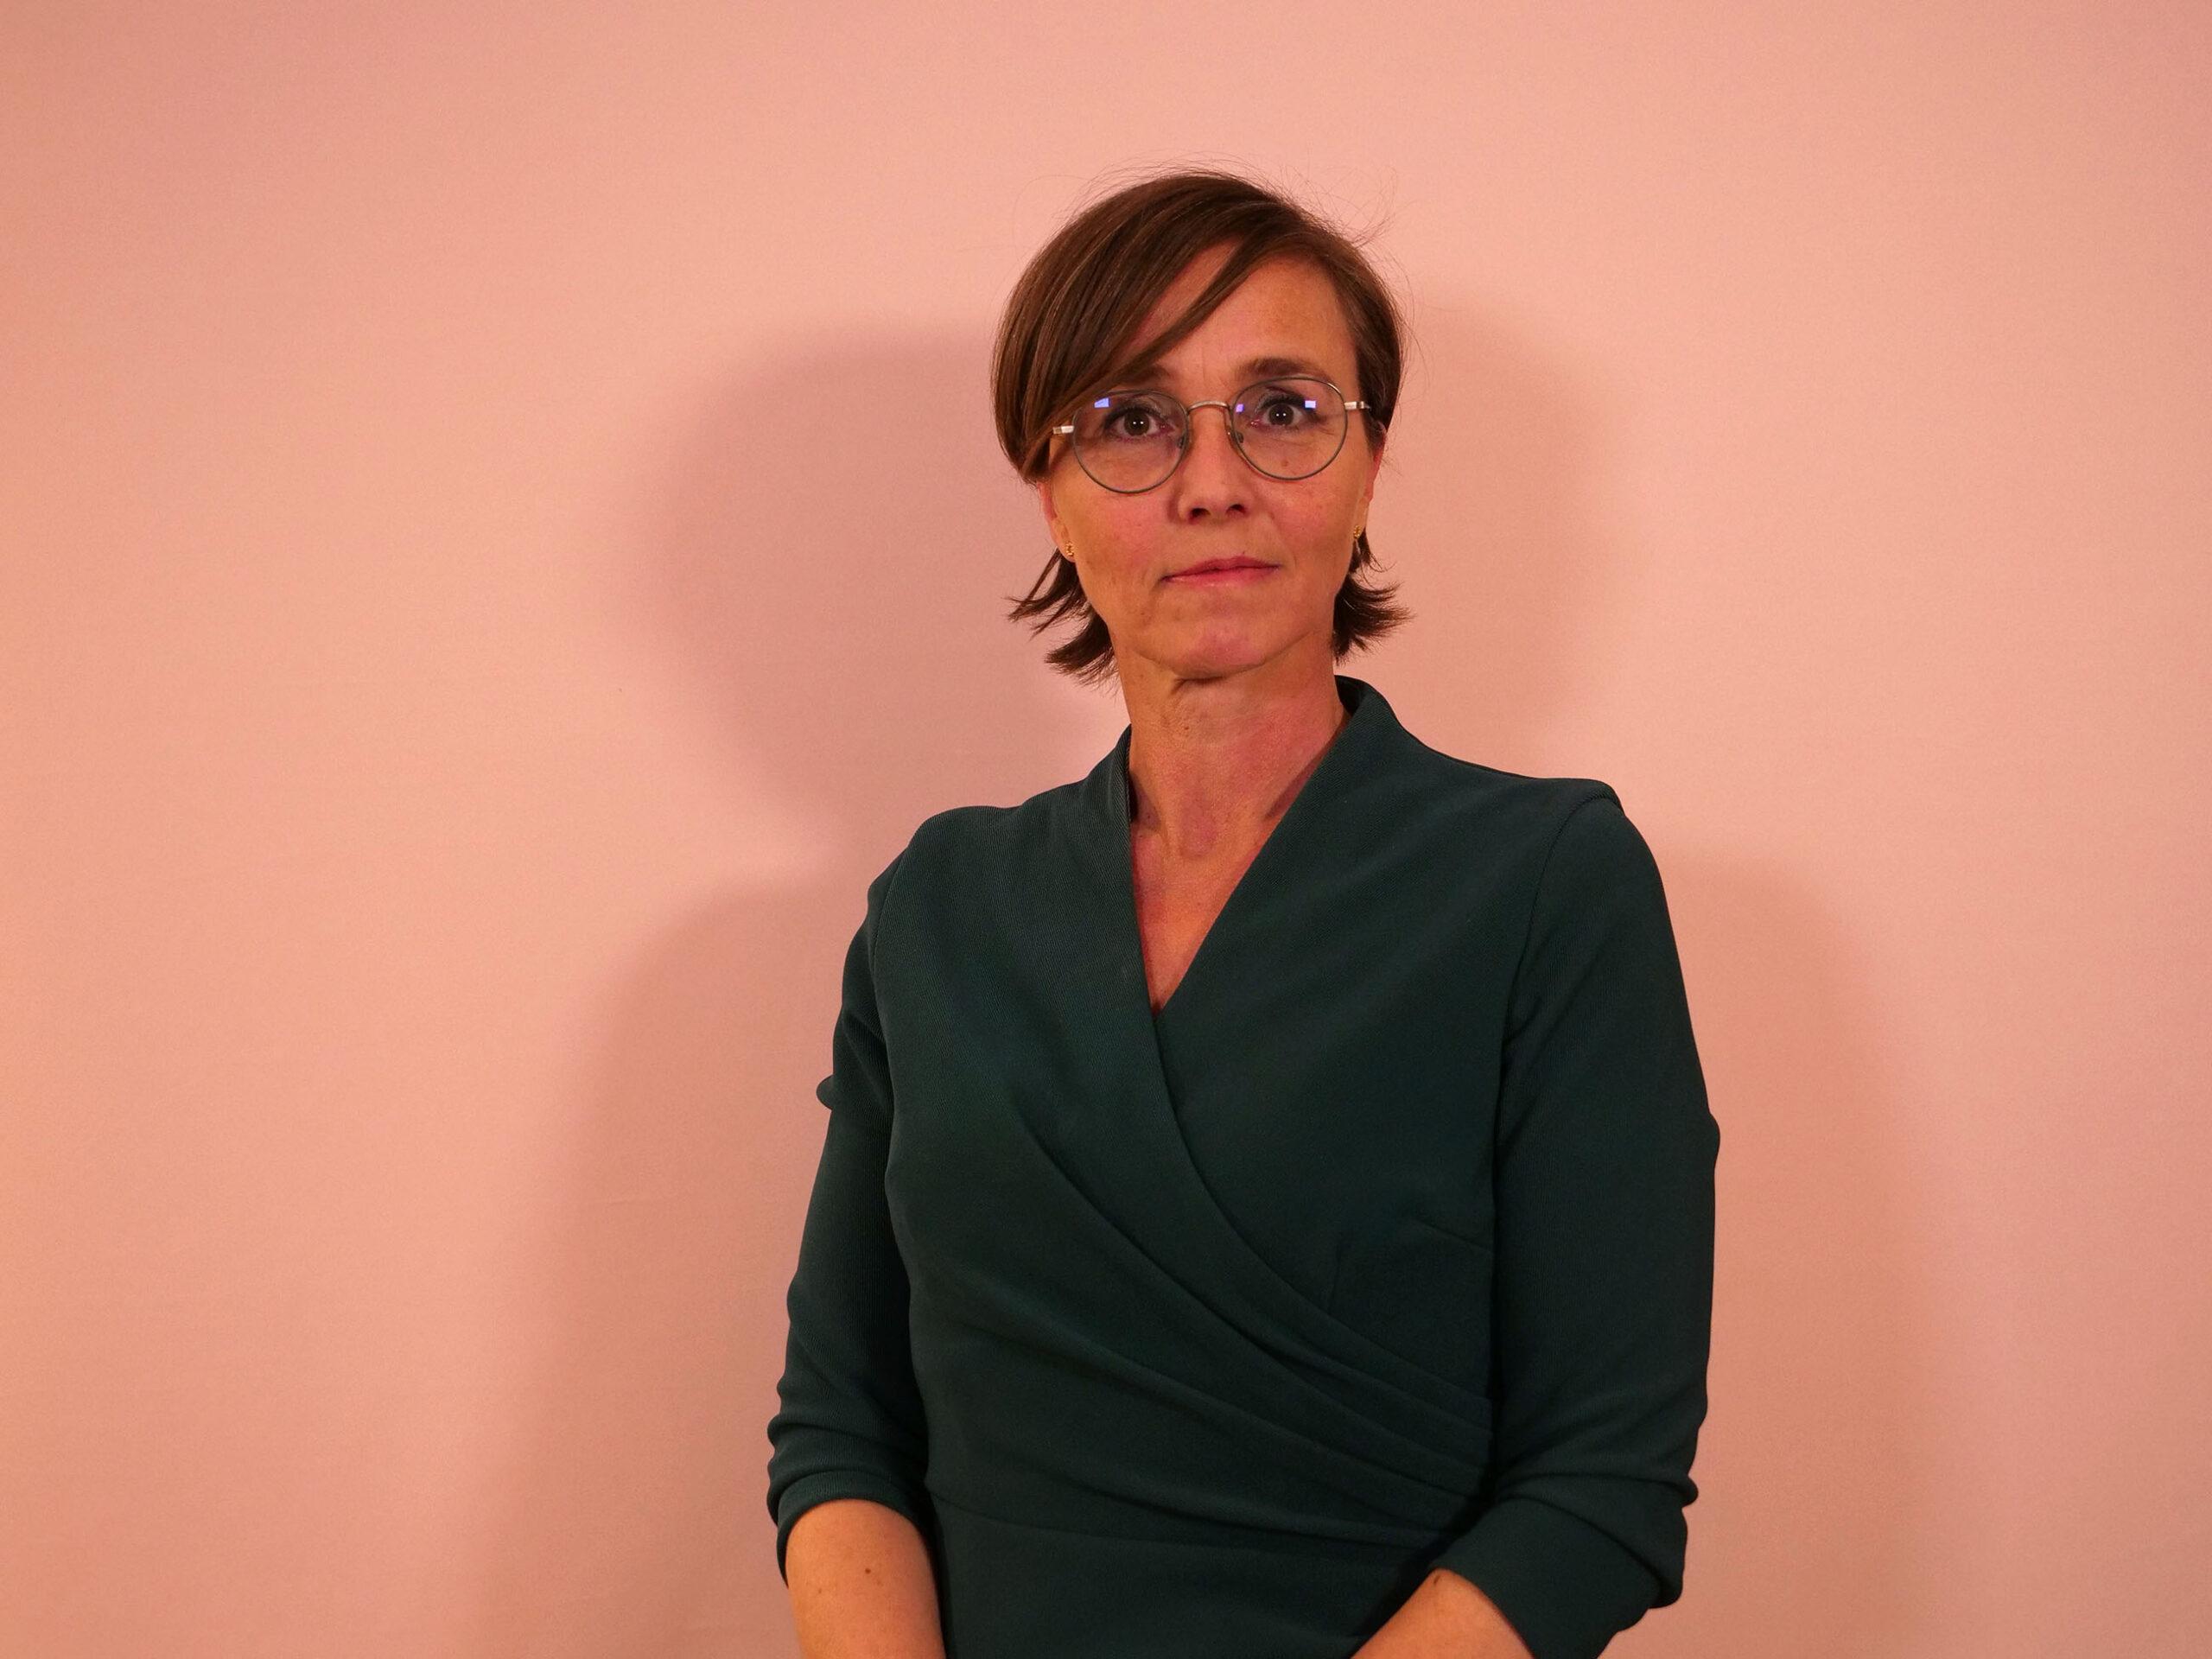 Marie Louise Toksvig til Storydays